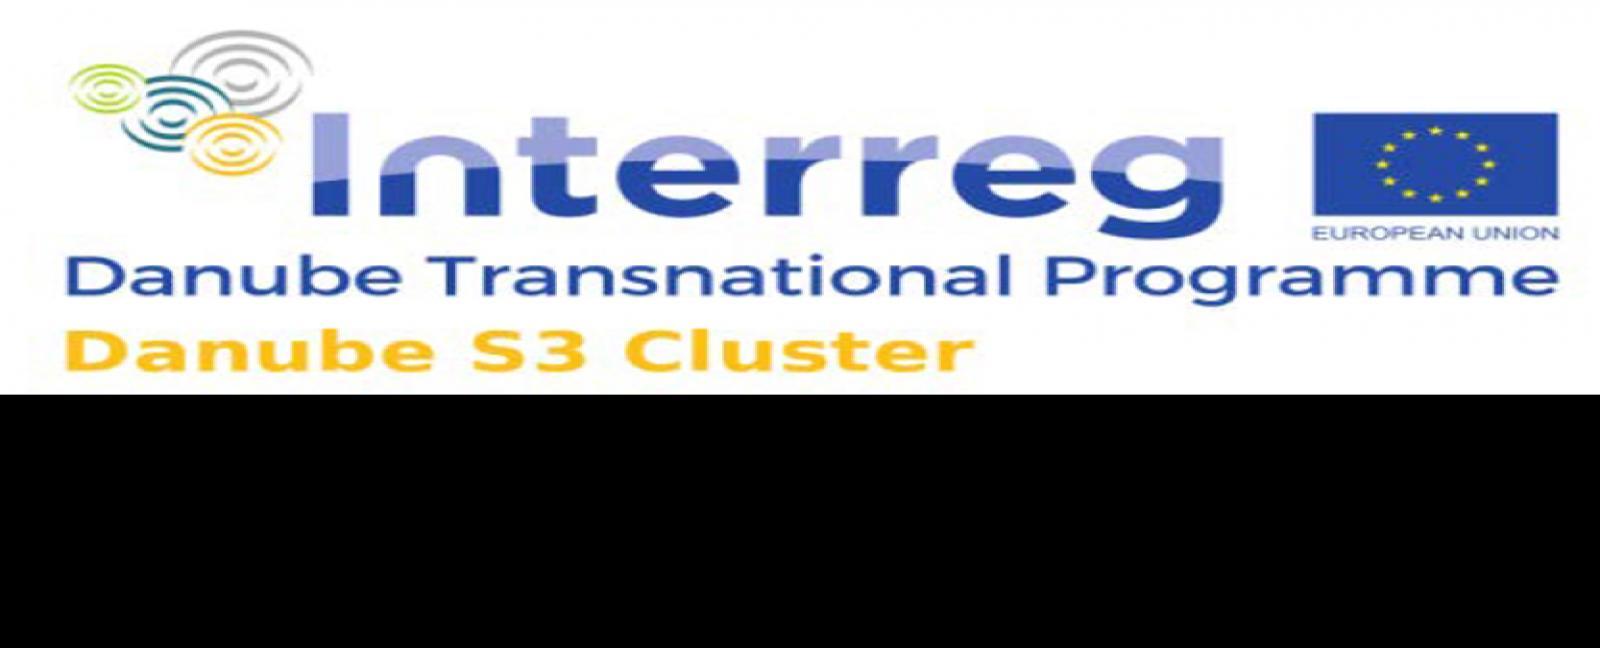 antet-danube-s3-cluster_0_0.jpg